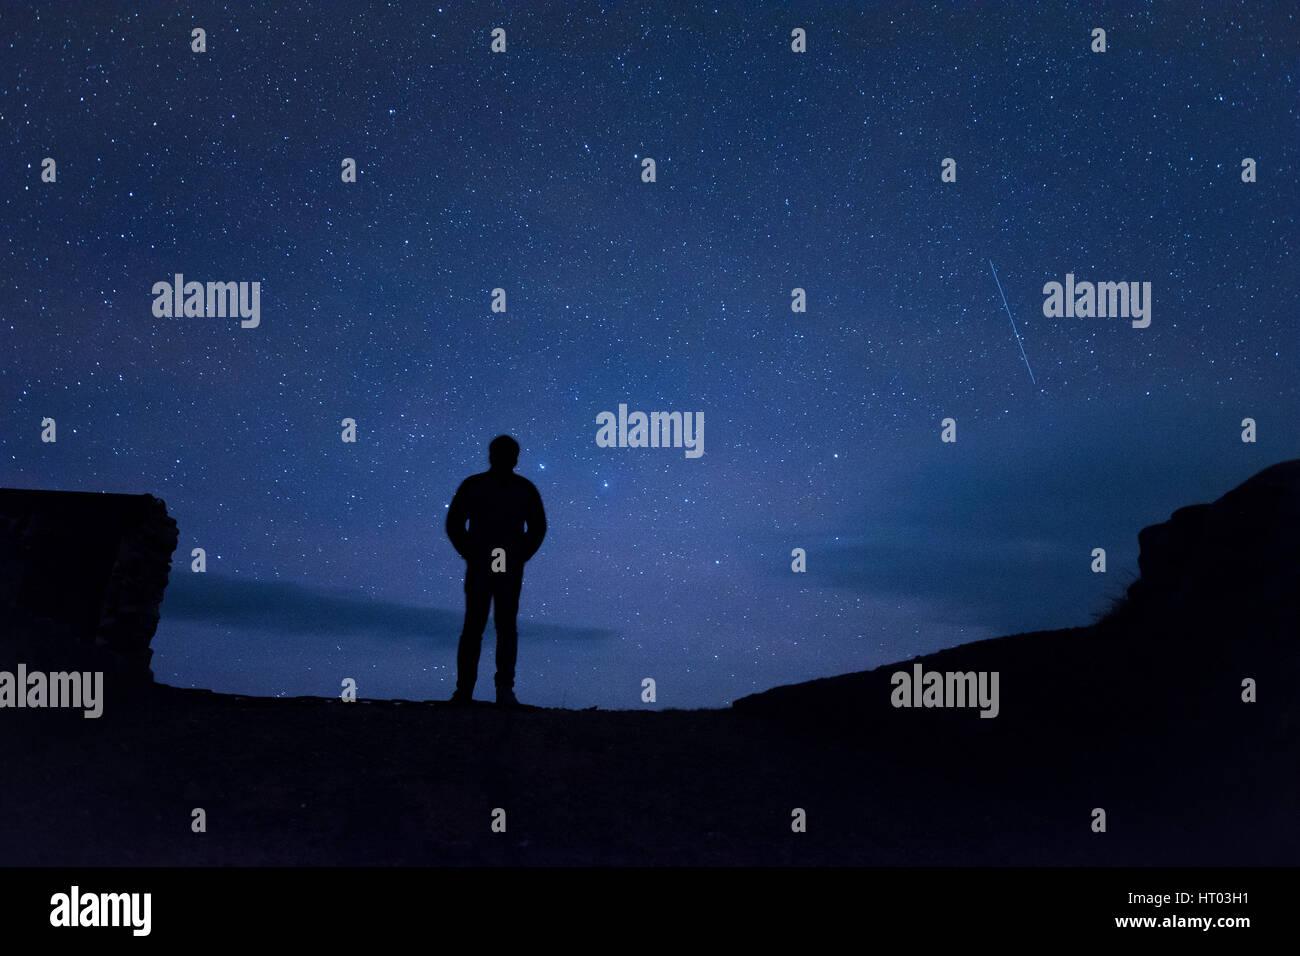 Man standing under stars at night - Cornwall, UK - Stock Image